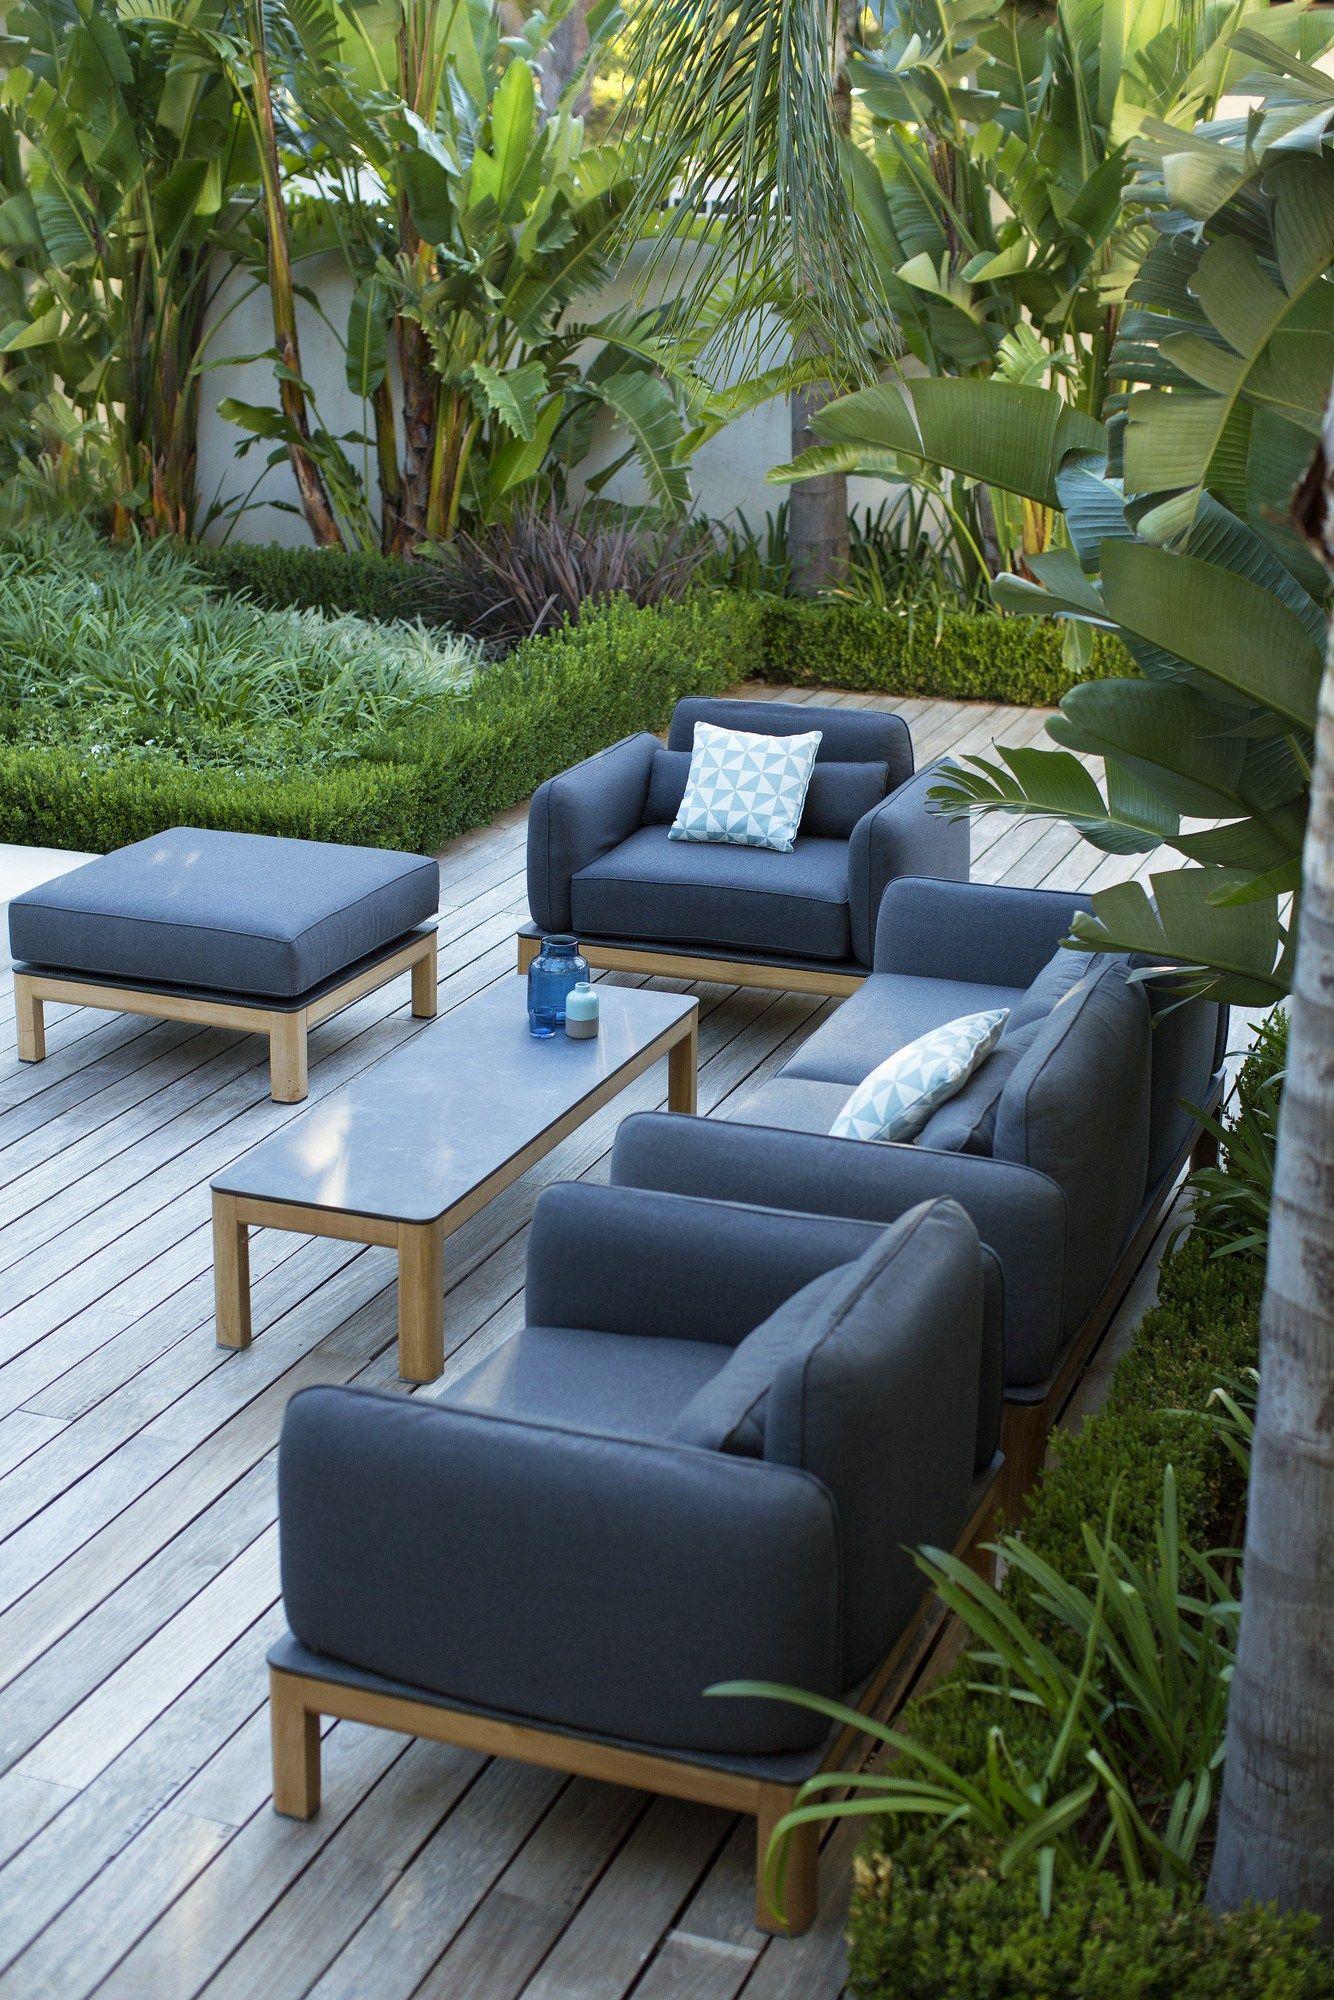 Tekura canap by les jardins design claude robin for Canape de jardin design